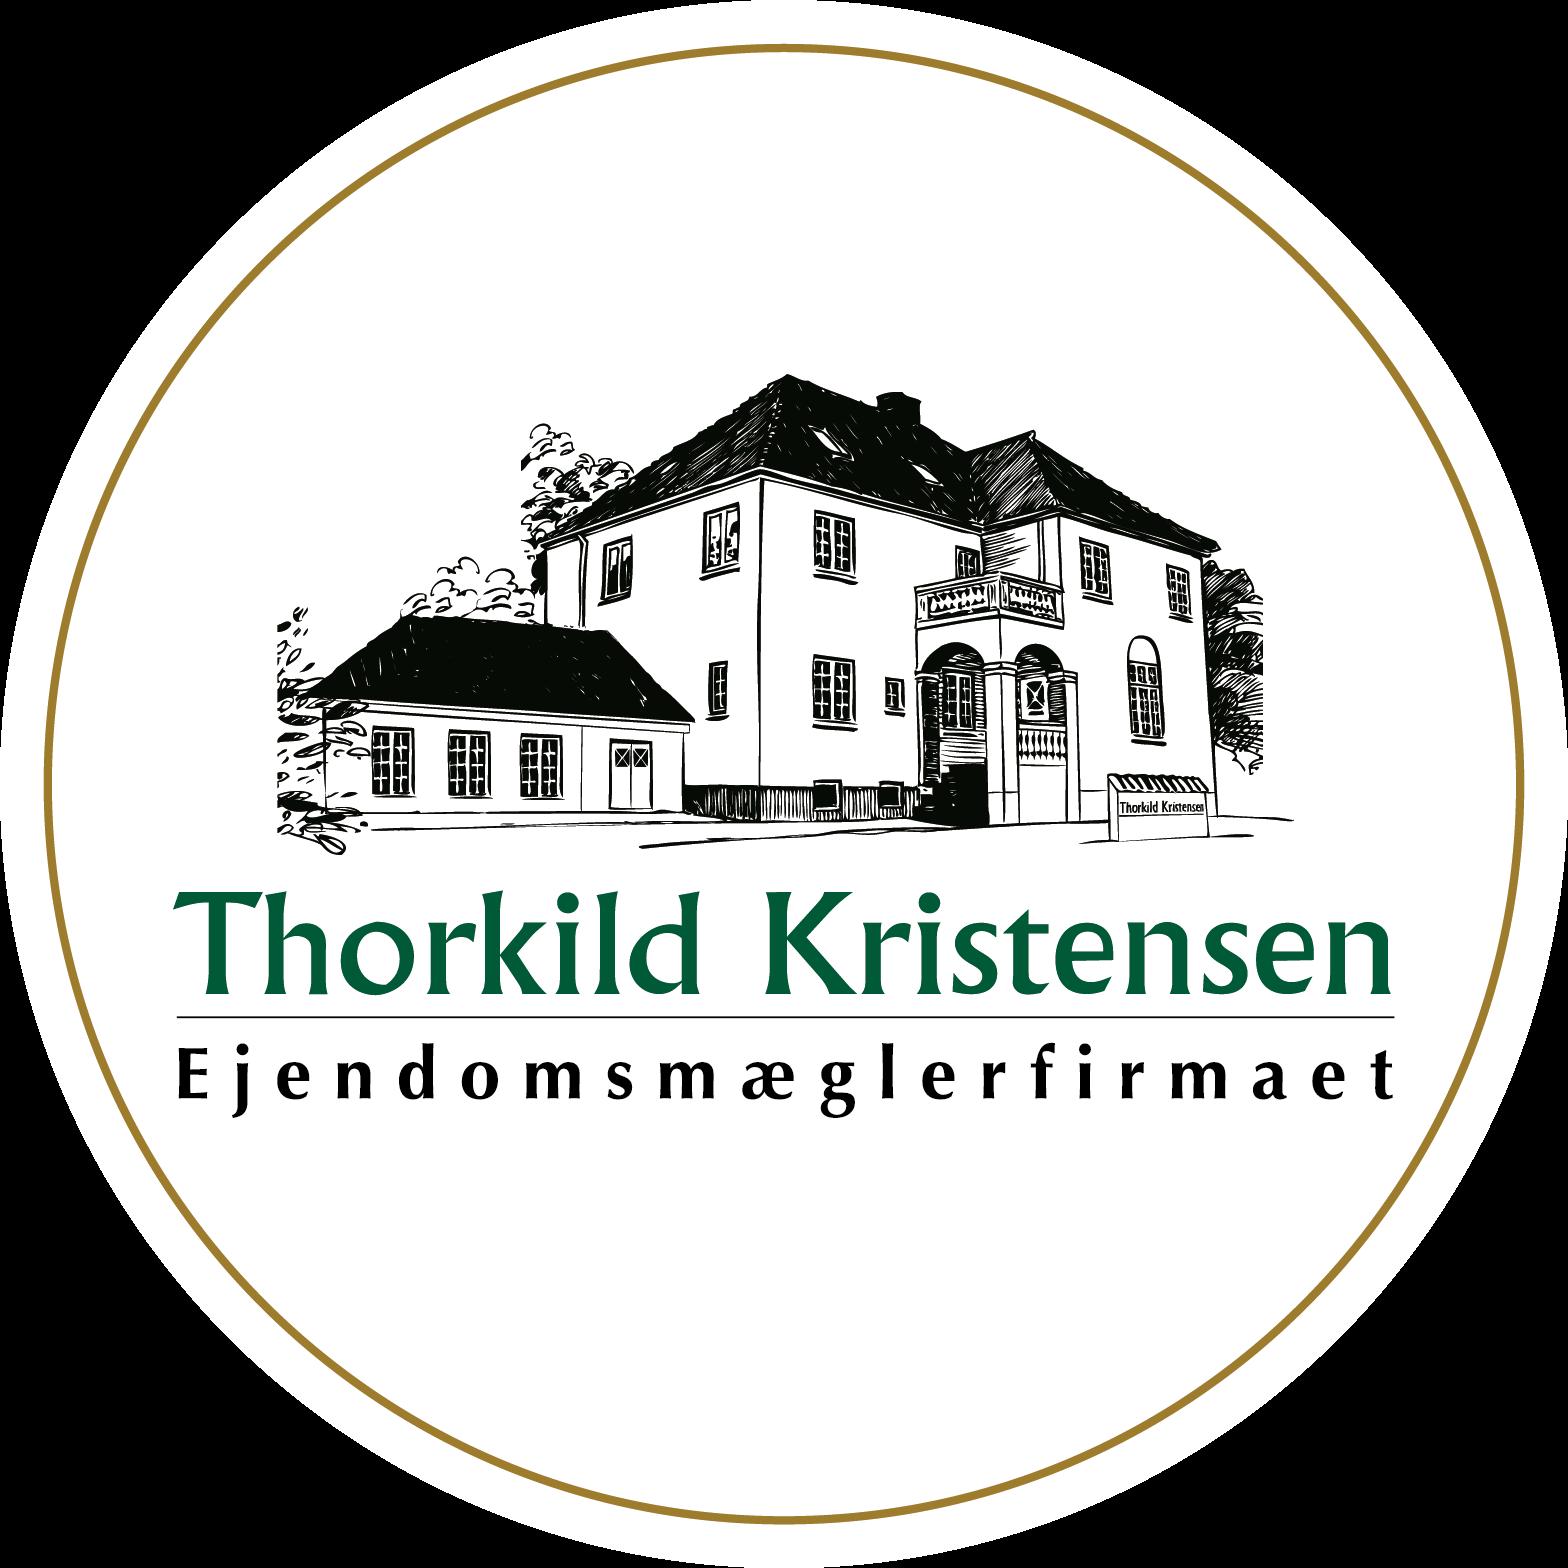 broker's logo image